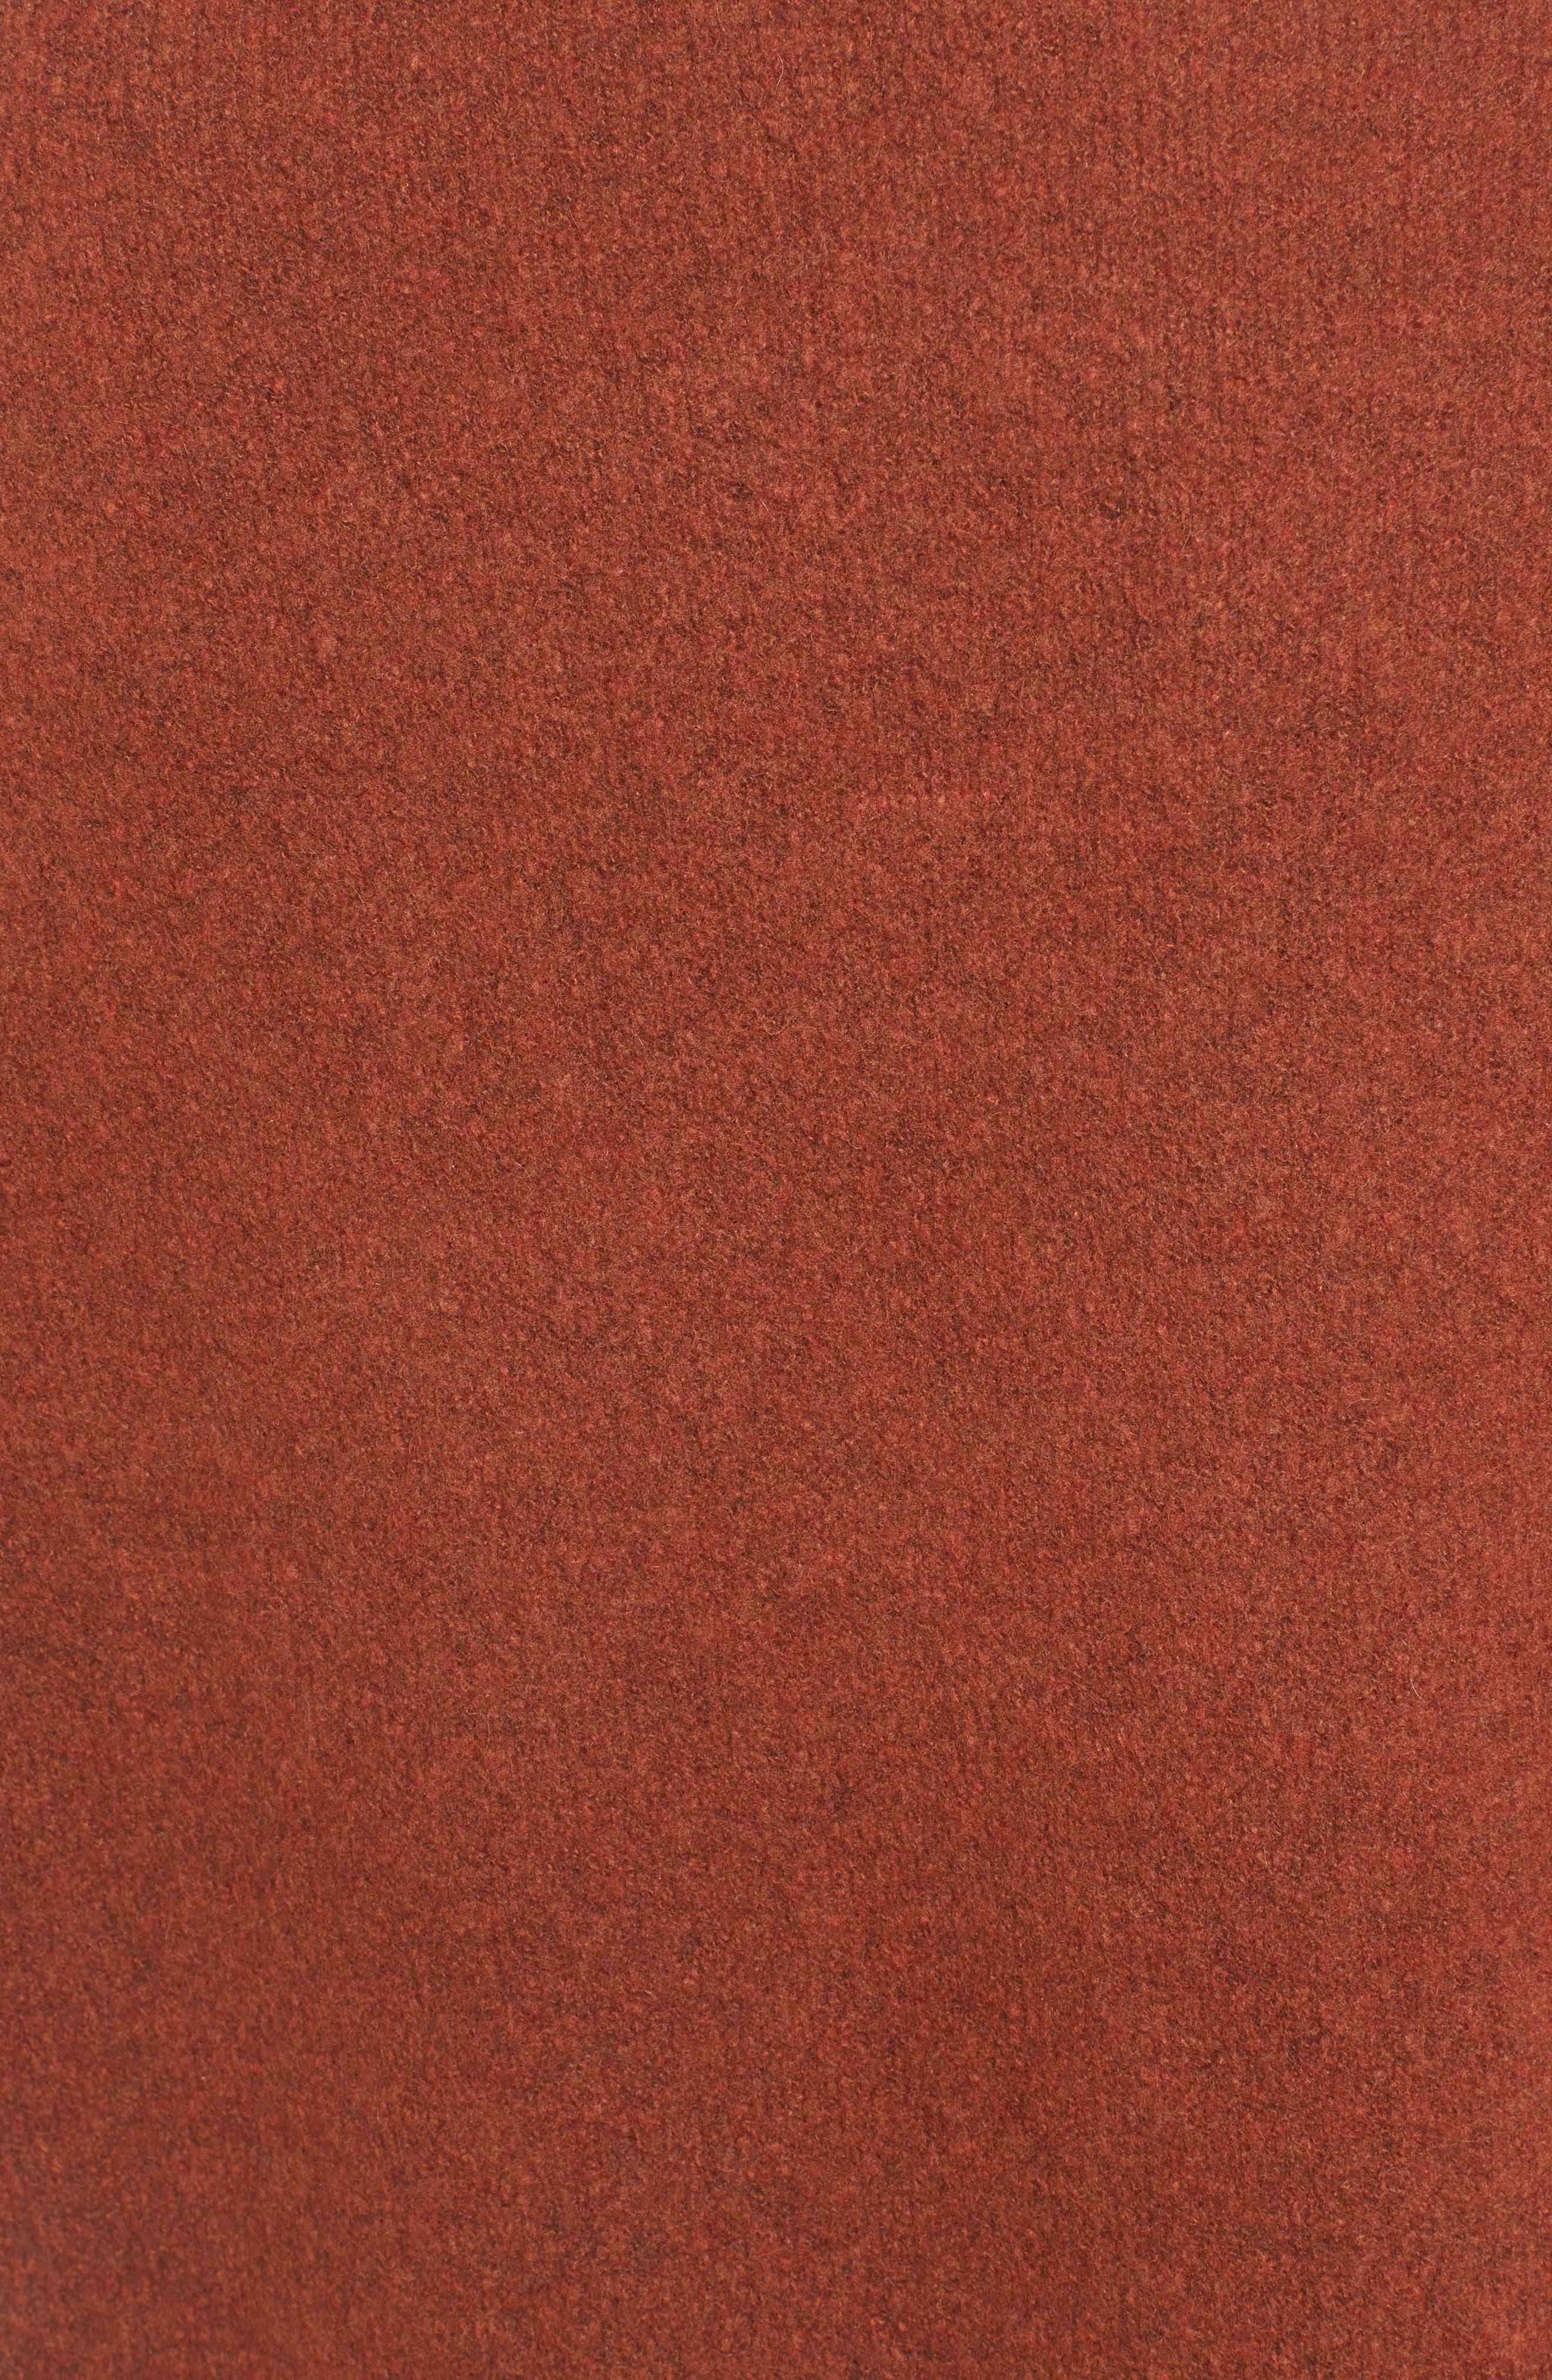 Oversize Cashmere Sweater,                             Alternate thumbnail 5, color,                             806